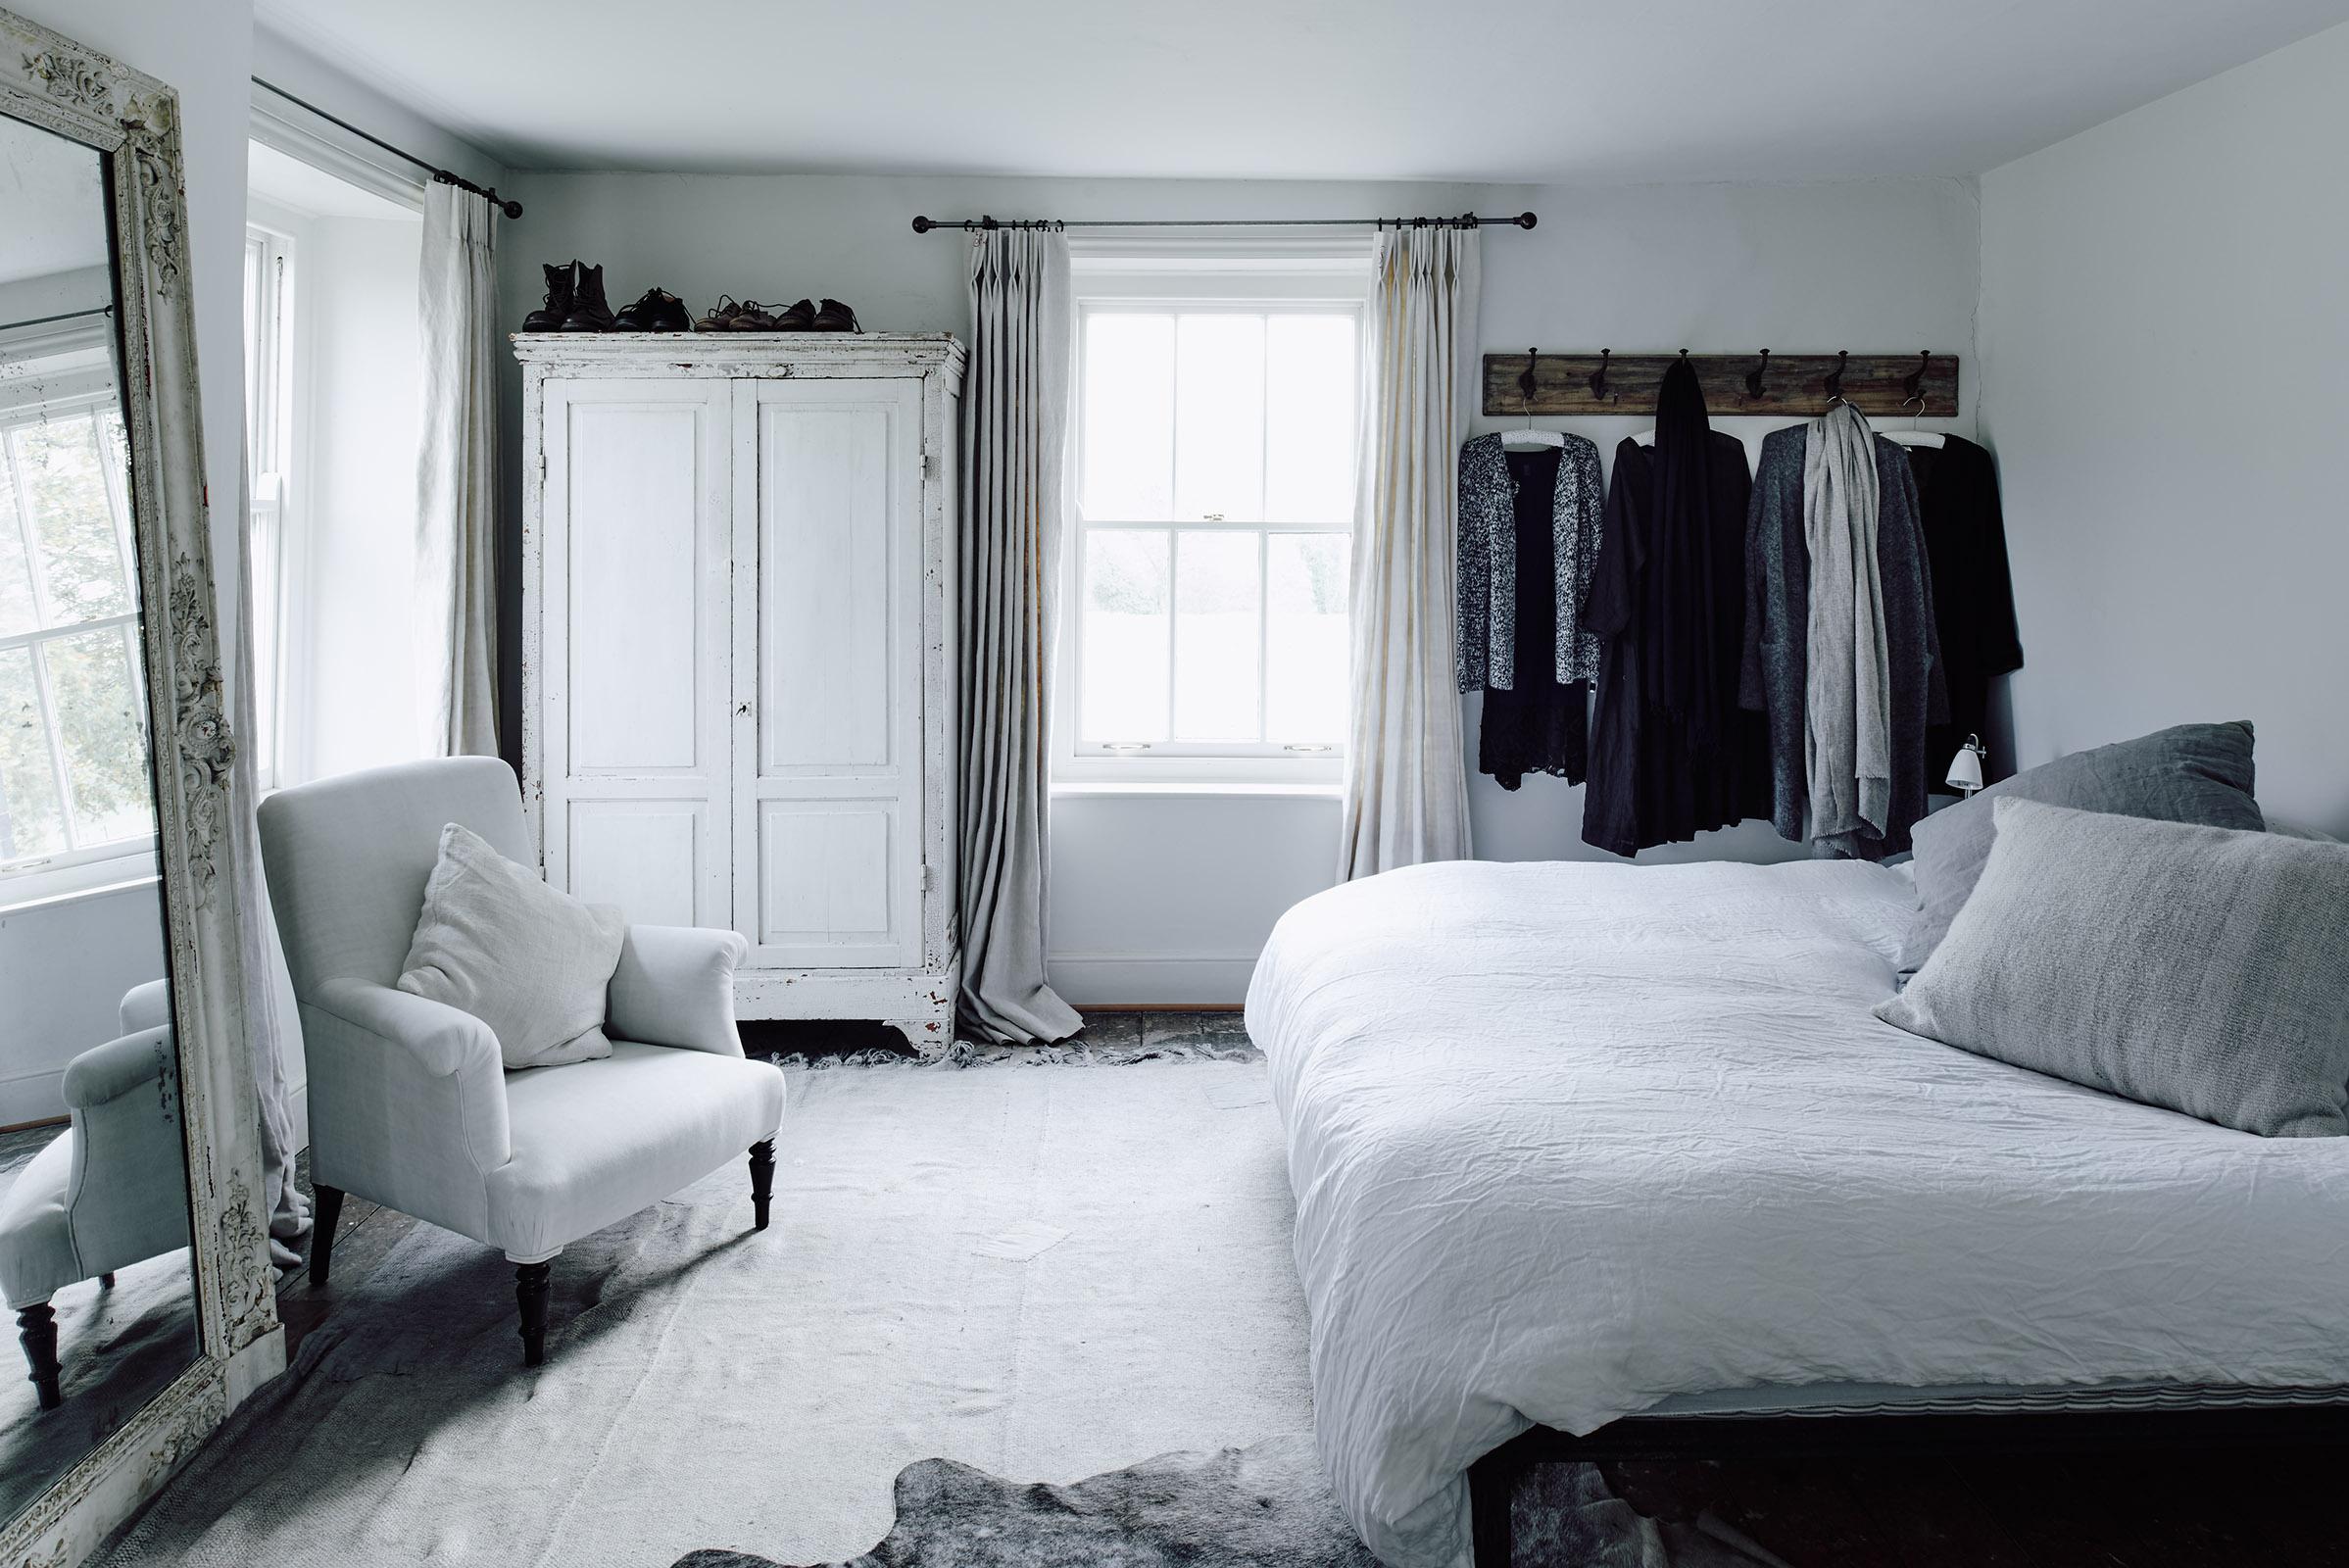 141017-SLM-Home-Bedroom-001-web-1600-px1.jpg